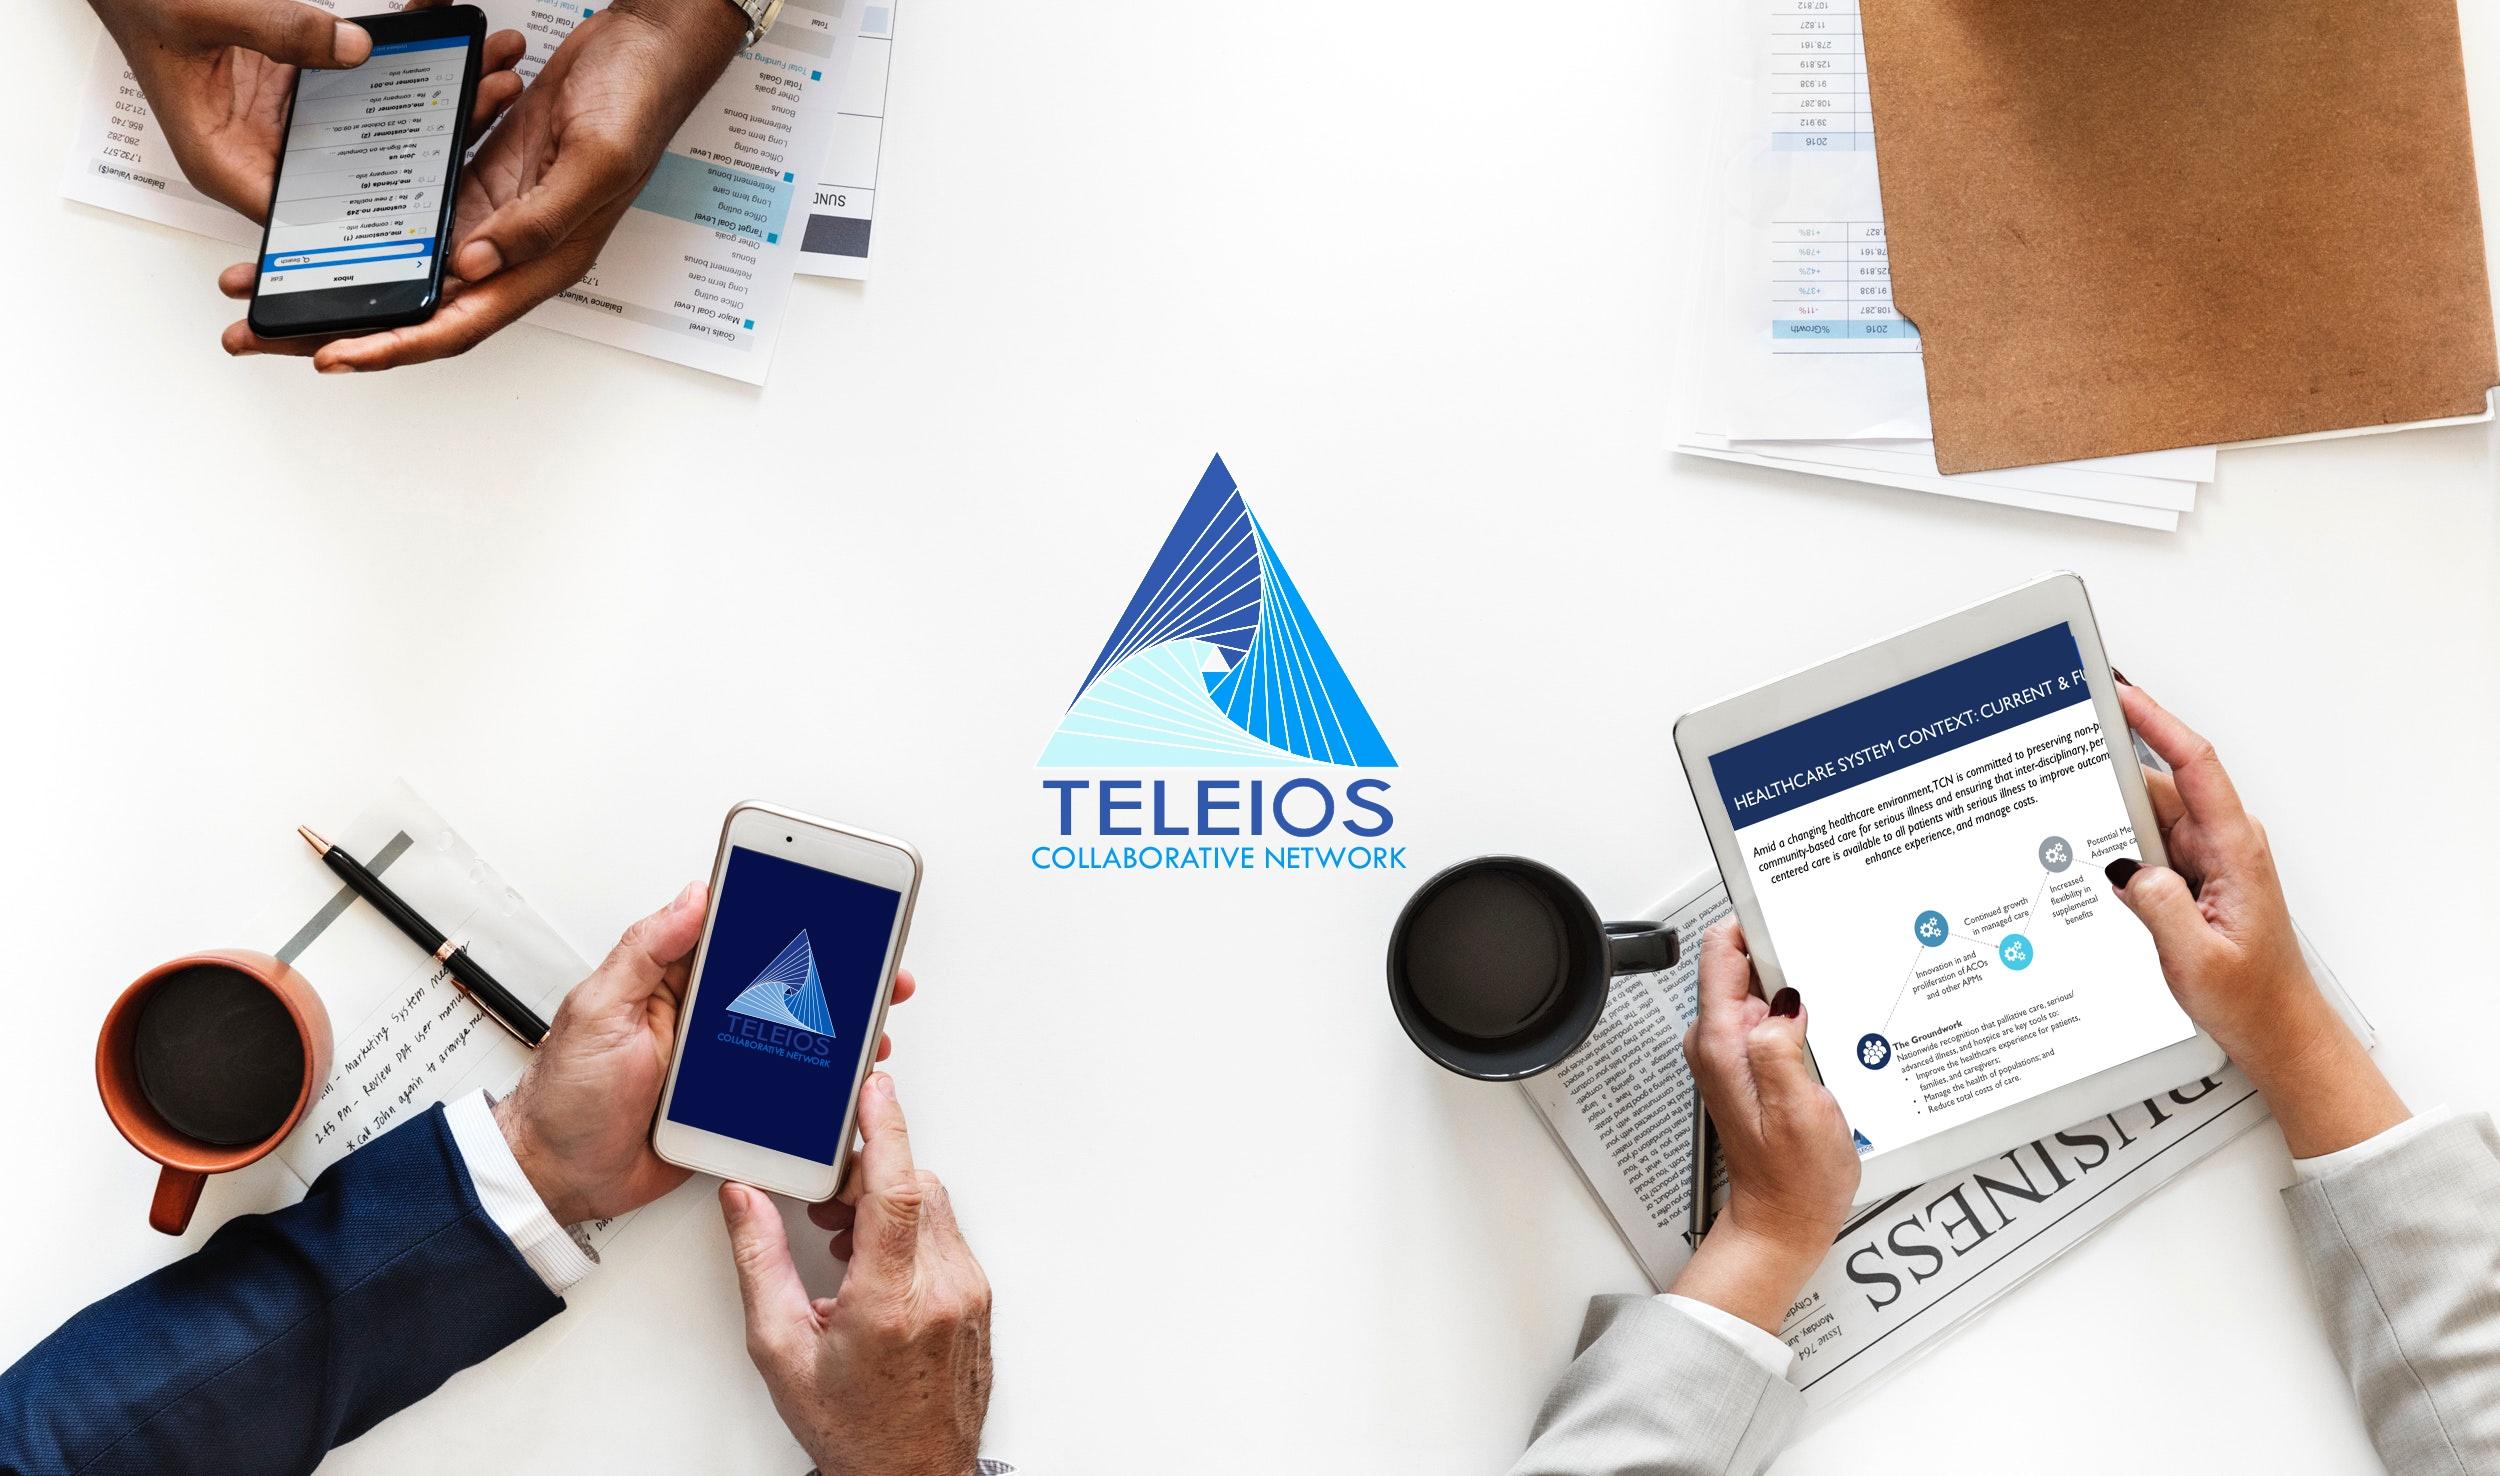 Teleios Collaborative Network image